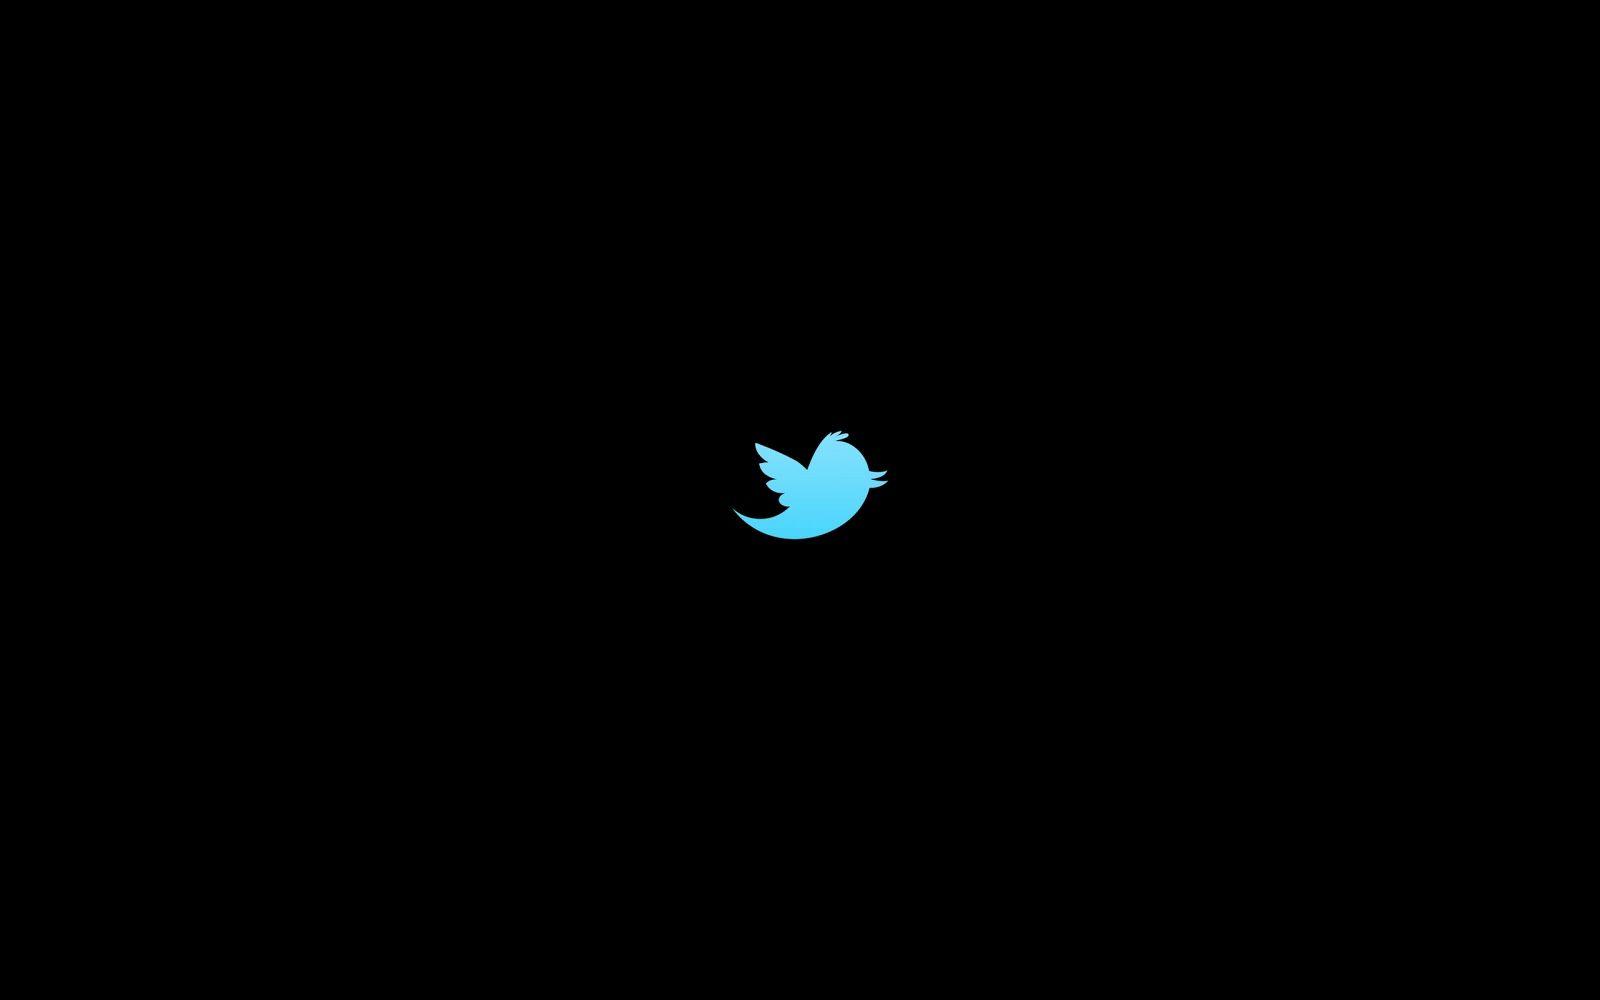 Twitter Wallpapers   Top Twitter Backgrounds   WallpaperAccess 1600x1000